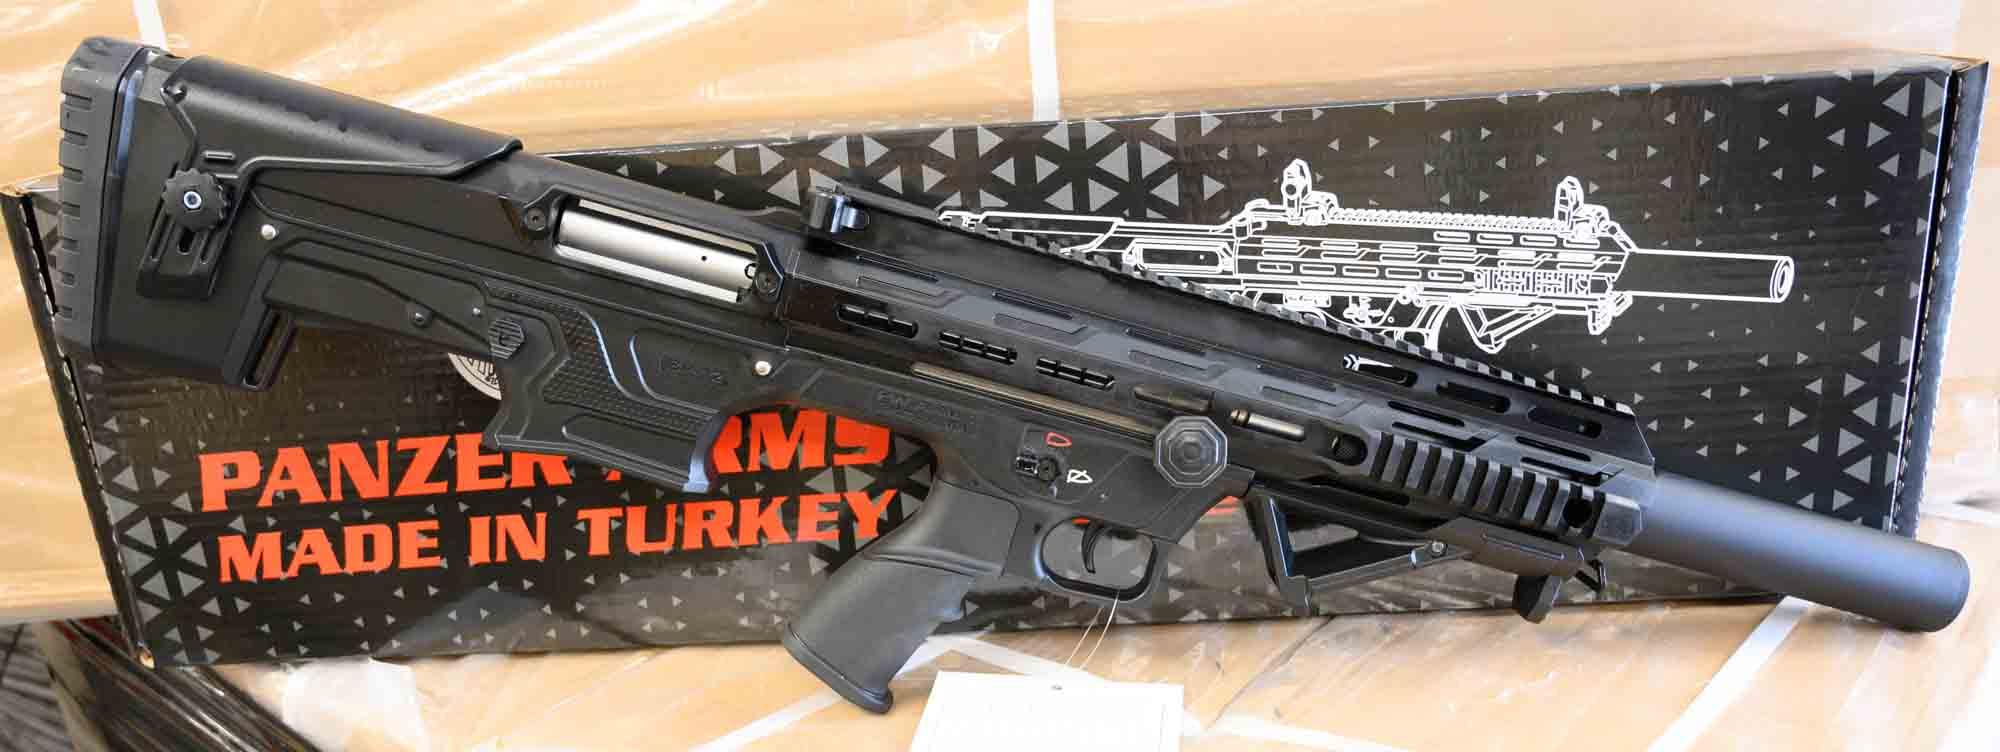 Panzer Arms BP-12 Bullpup Shotgun 12ga · 12 gauge· DK Firearms